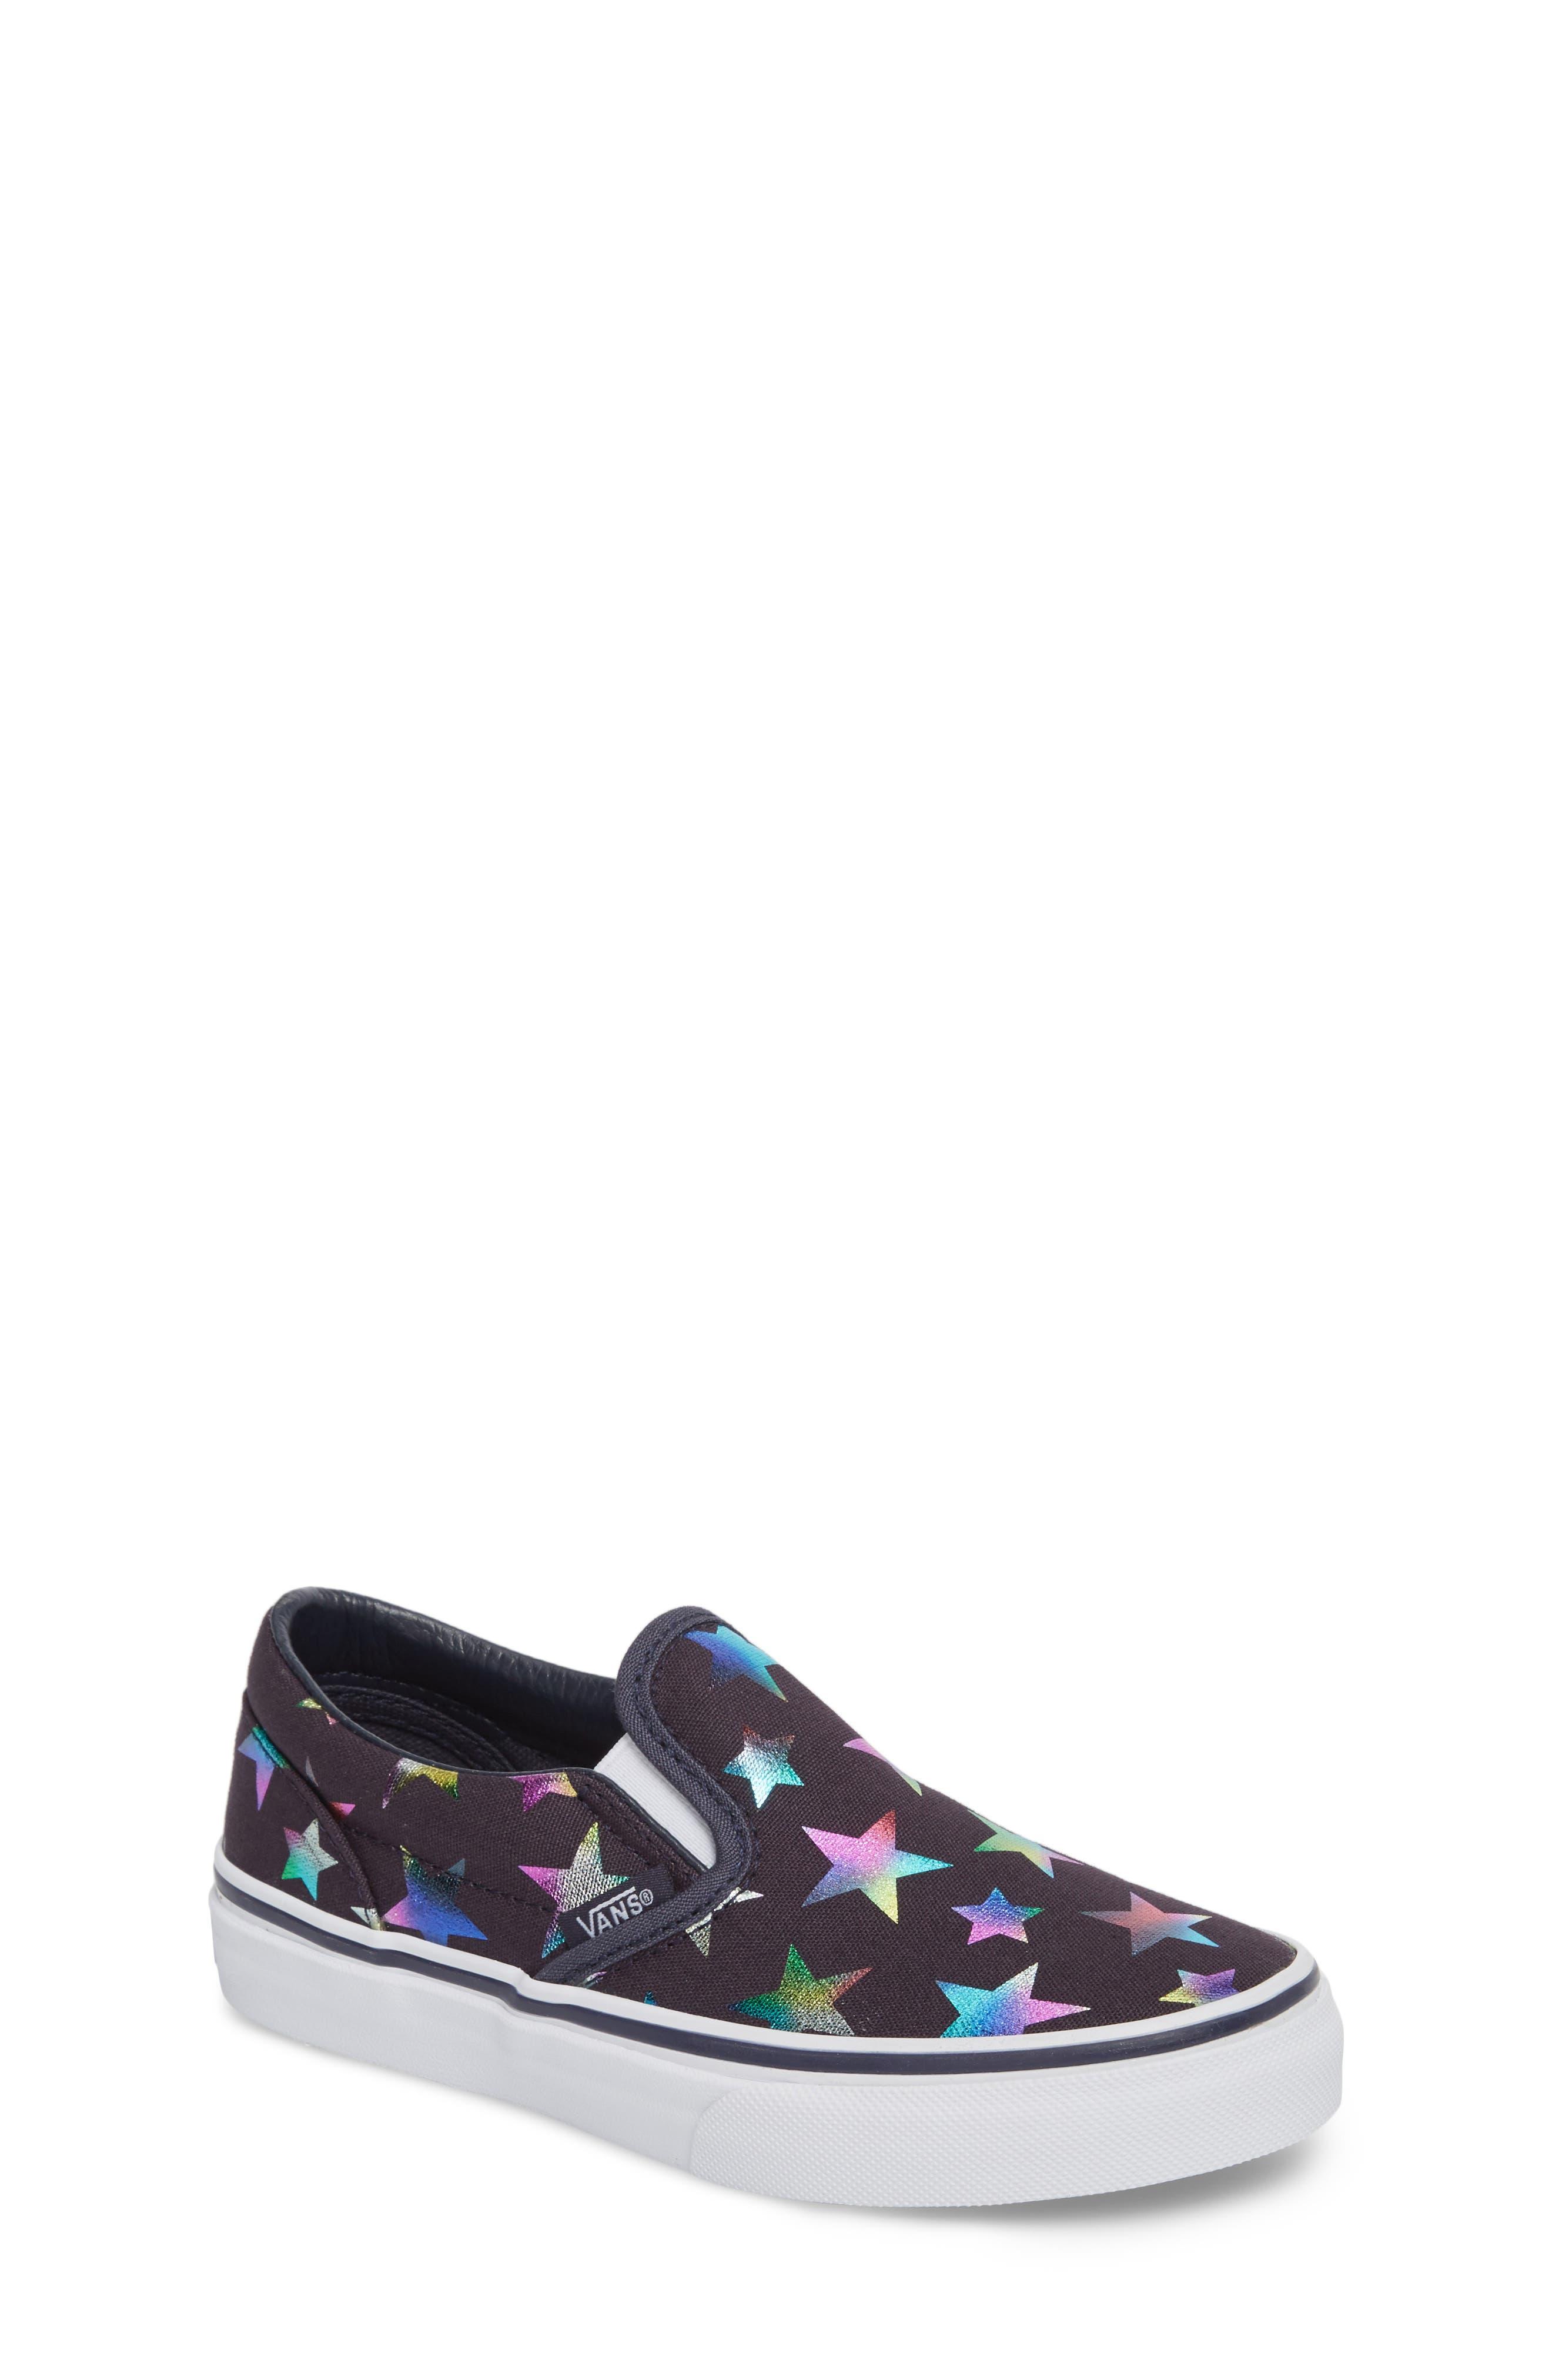 Classic Rainbow Shimmer Star Slip-On Sneaker,                             Main thumbnail 1, color,                             Parisian Night Foil Stars